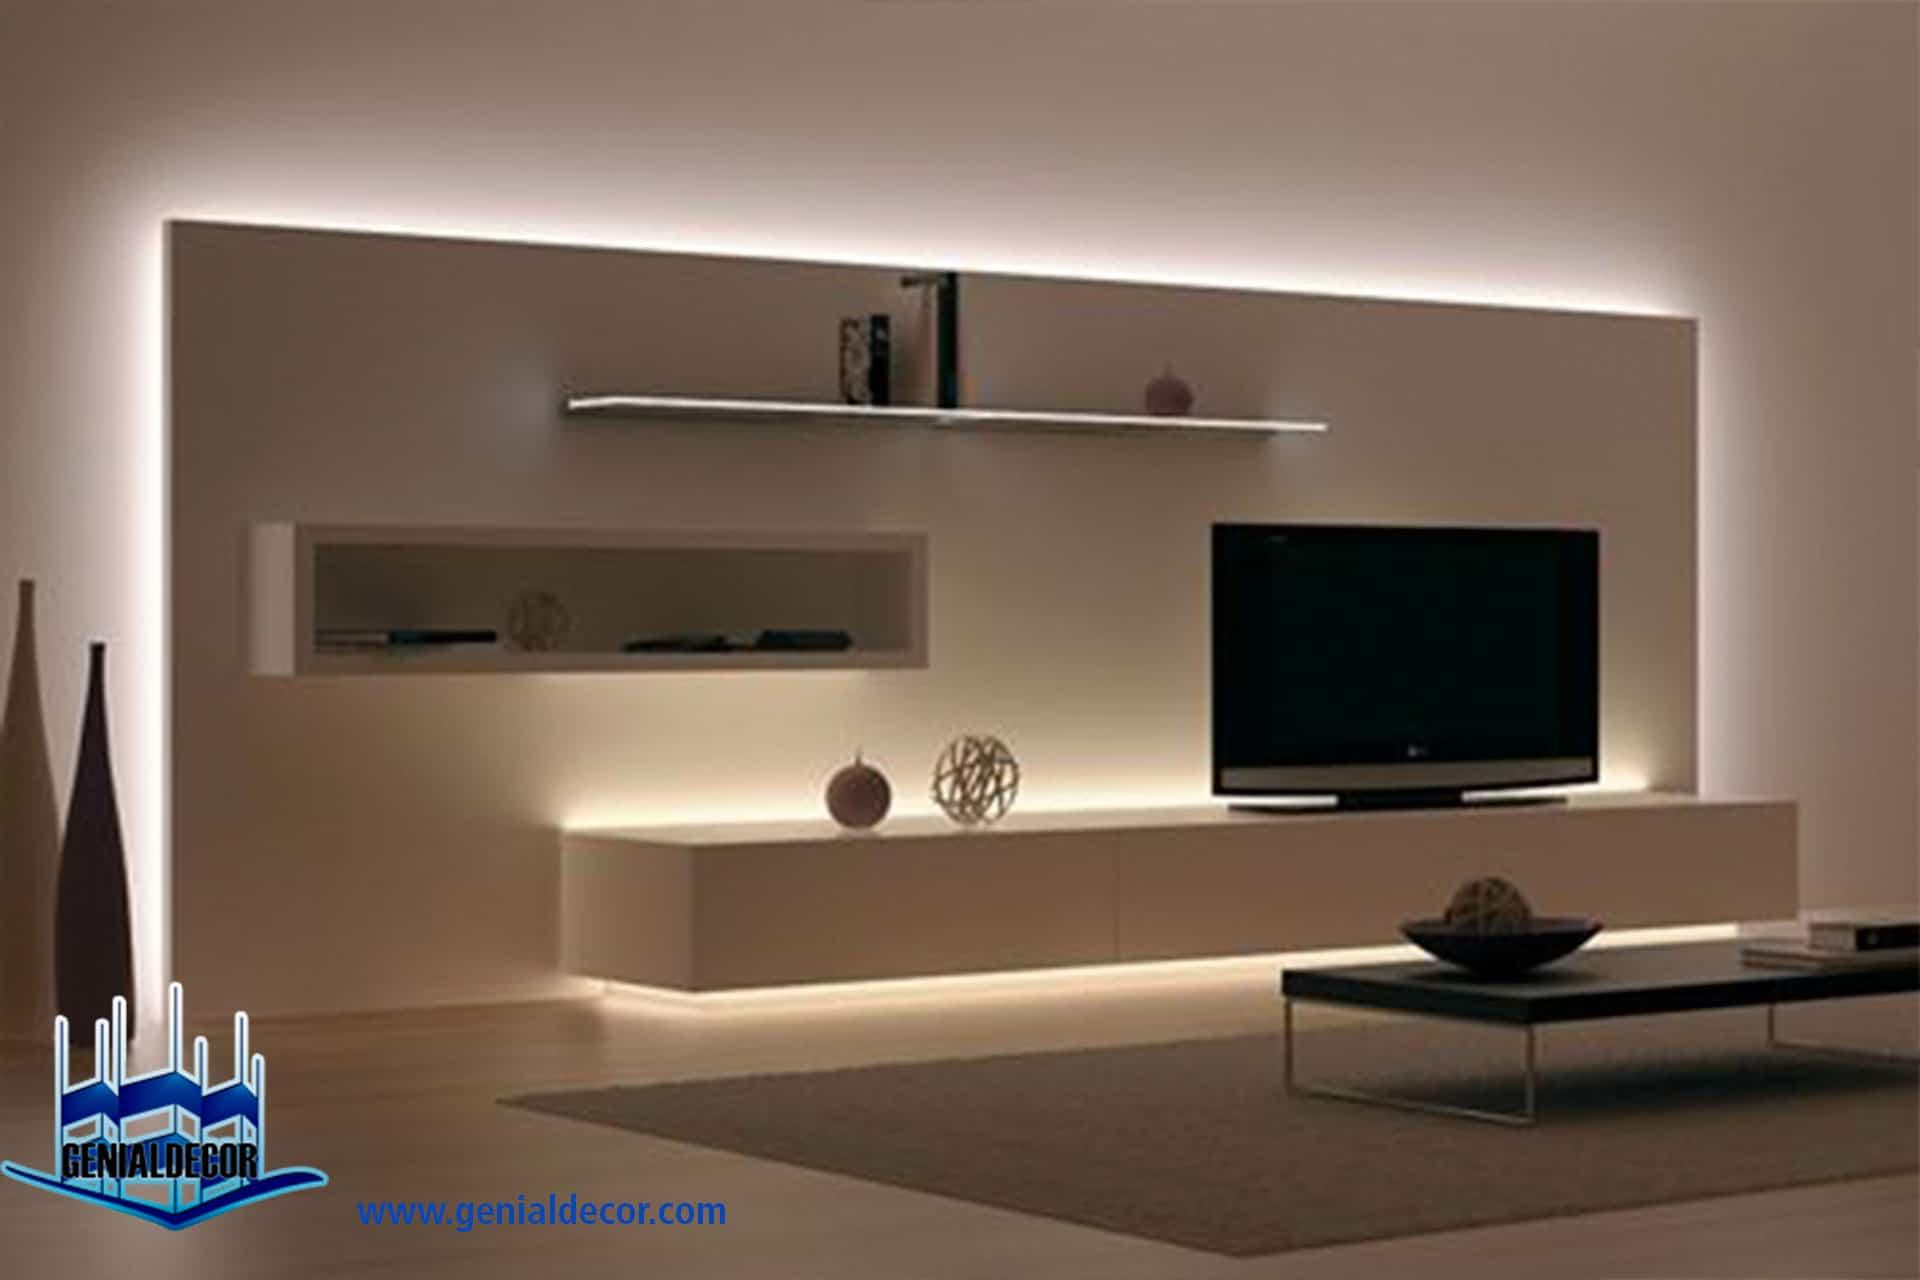 Top 28 muebles y decoraci 243 n decoraci 243 n de for Muebles top